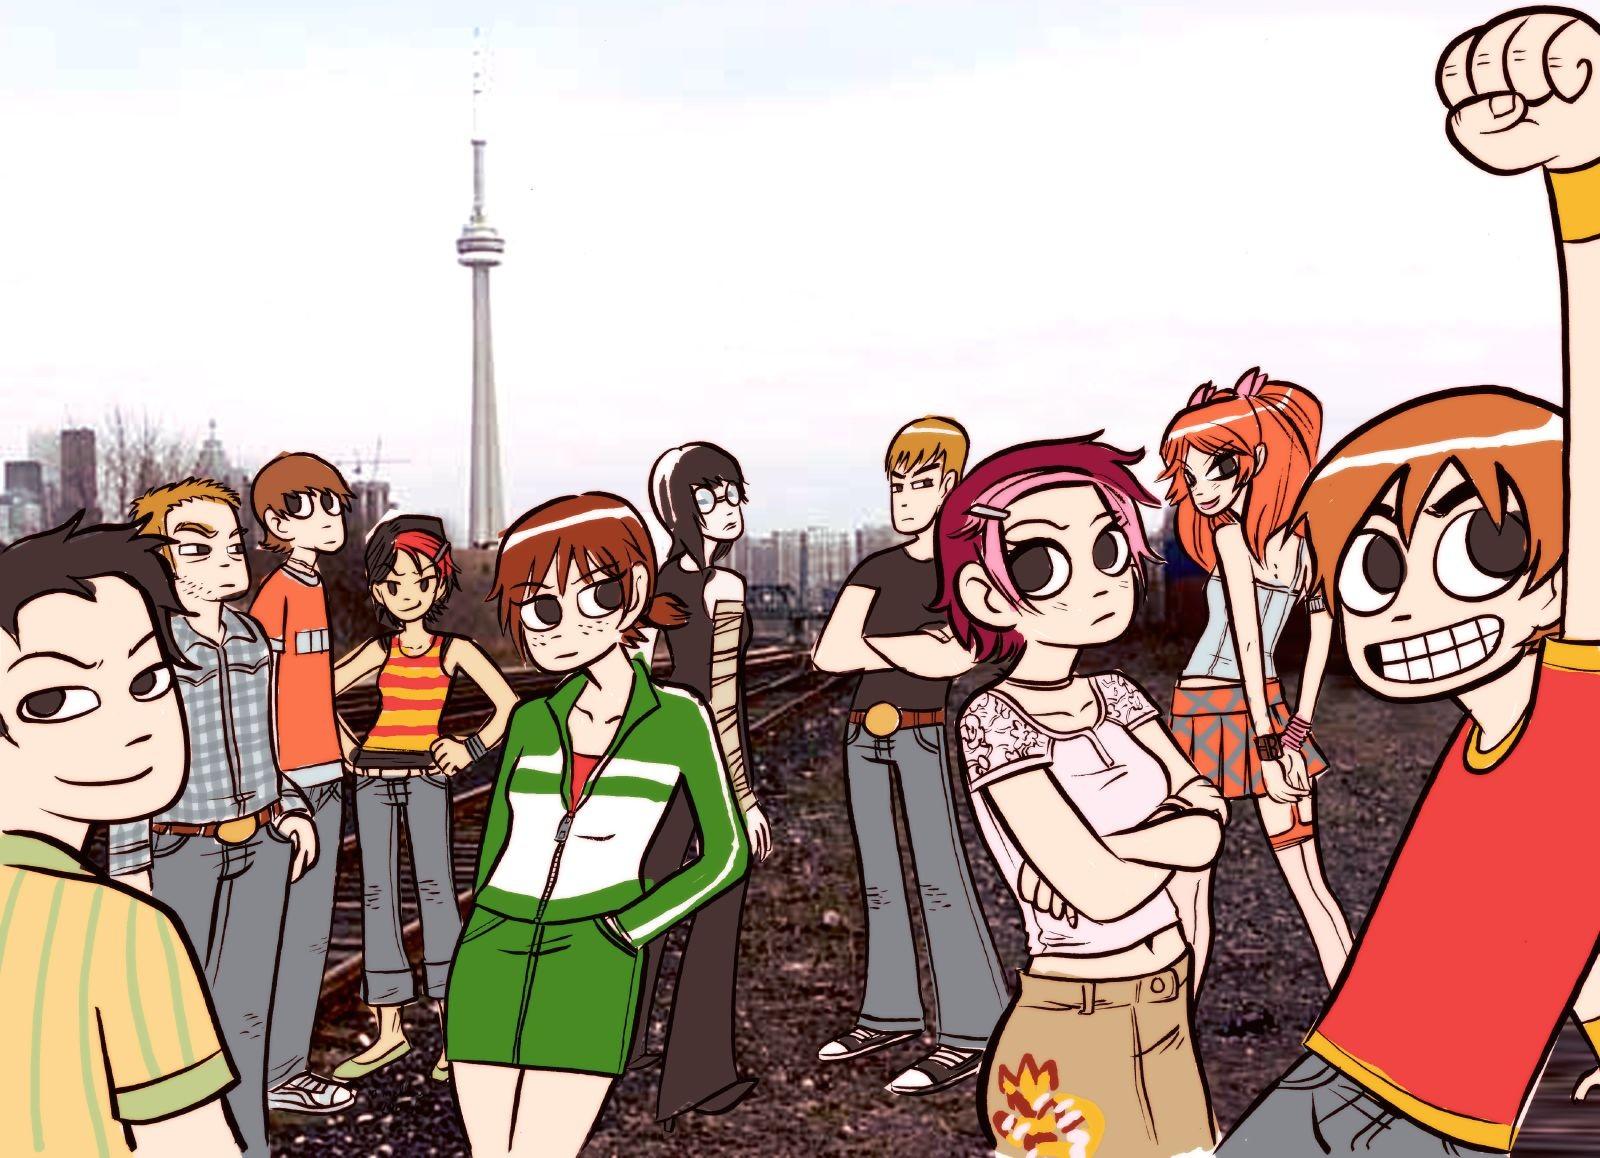 Wallpaper Illustration Anime Cartoon Scott Pilgrim